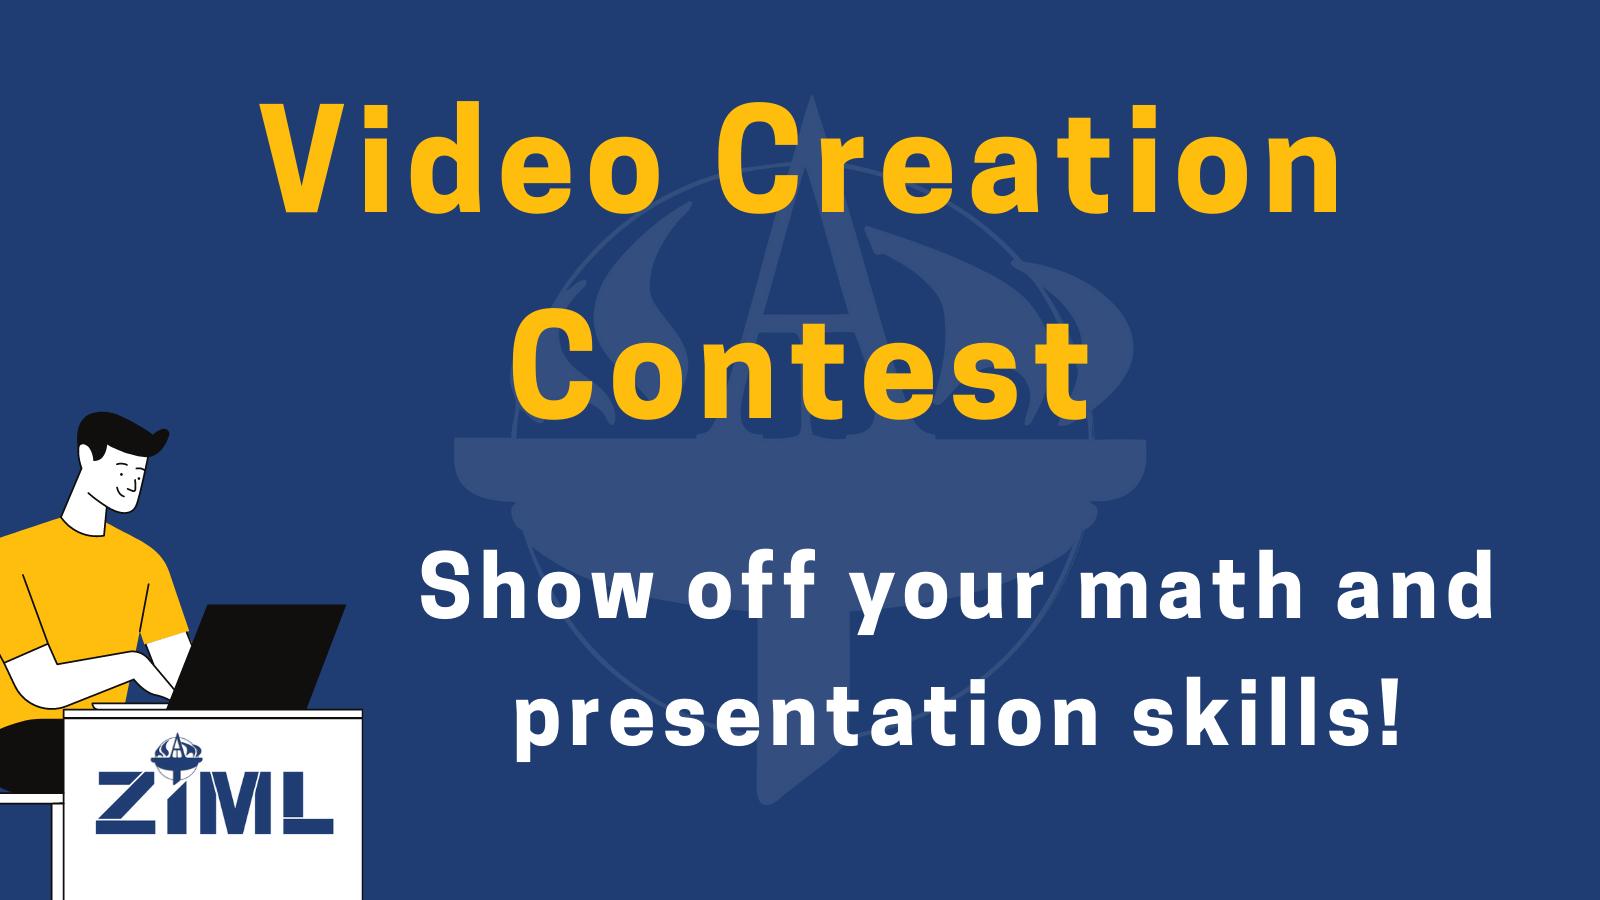 Video Creation Contest